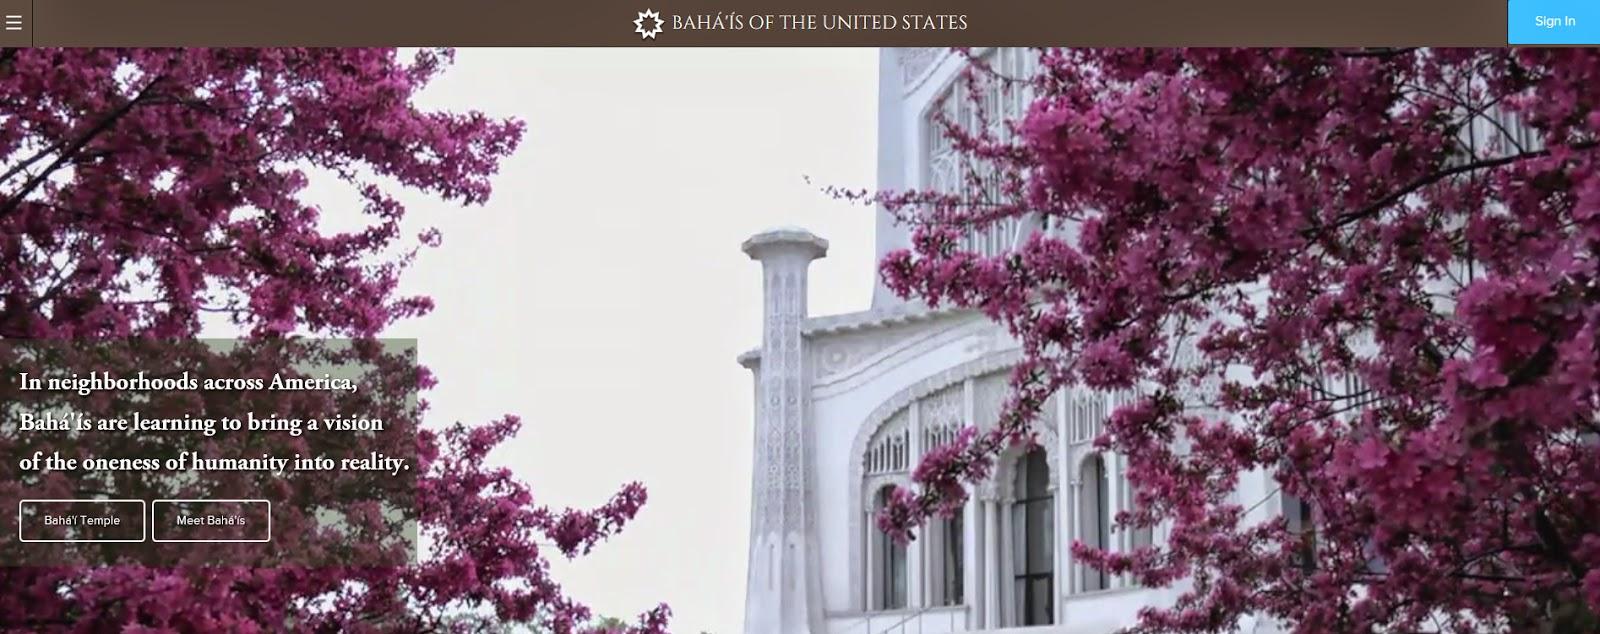 Сайт американской общины бахаи